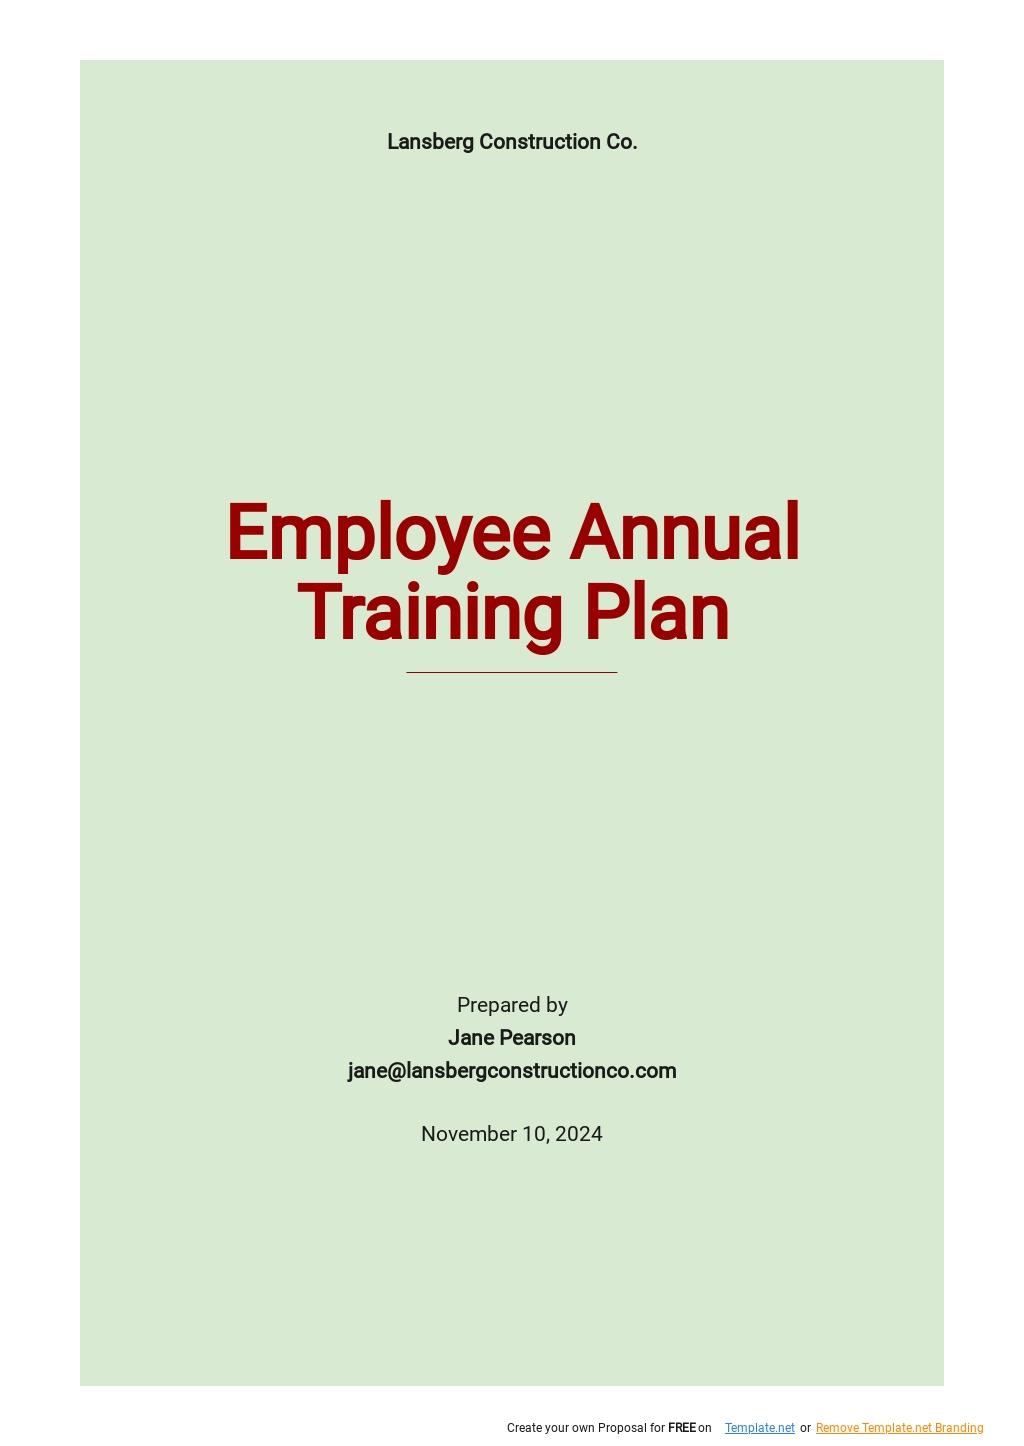 Employee Annual Training Plan Template.jpe